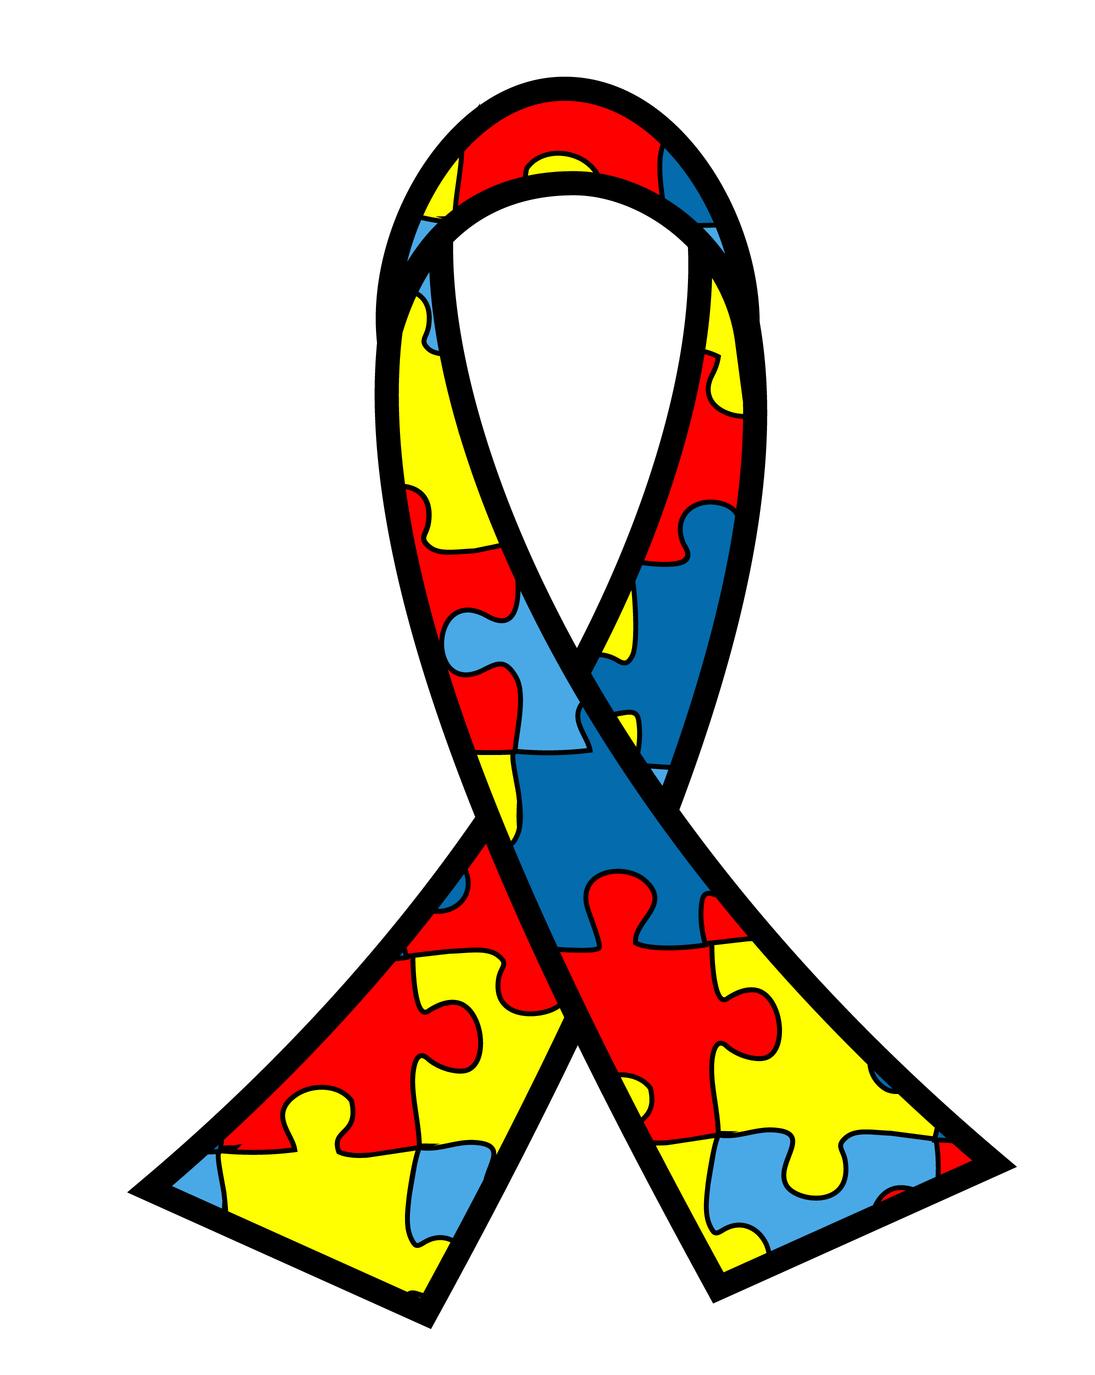 autism puzzle piece template - Boat.jeremyeaton.co